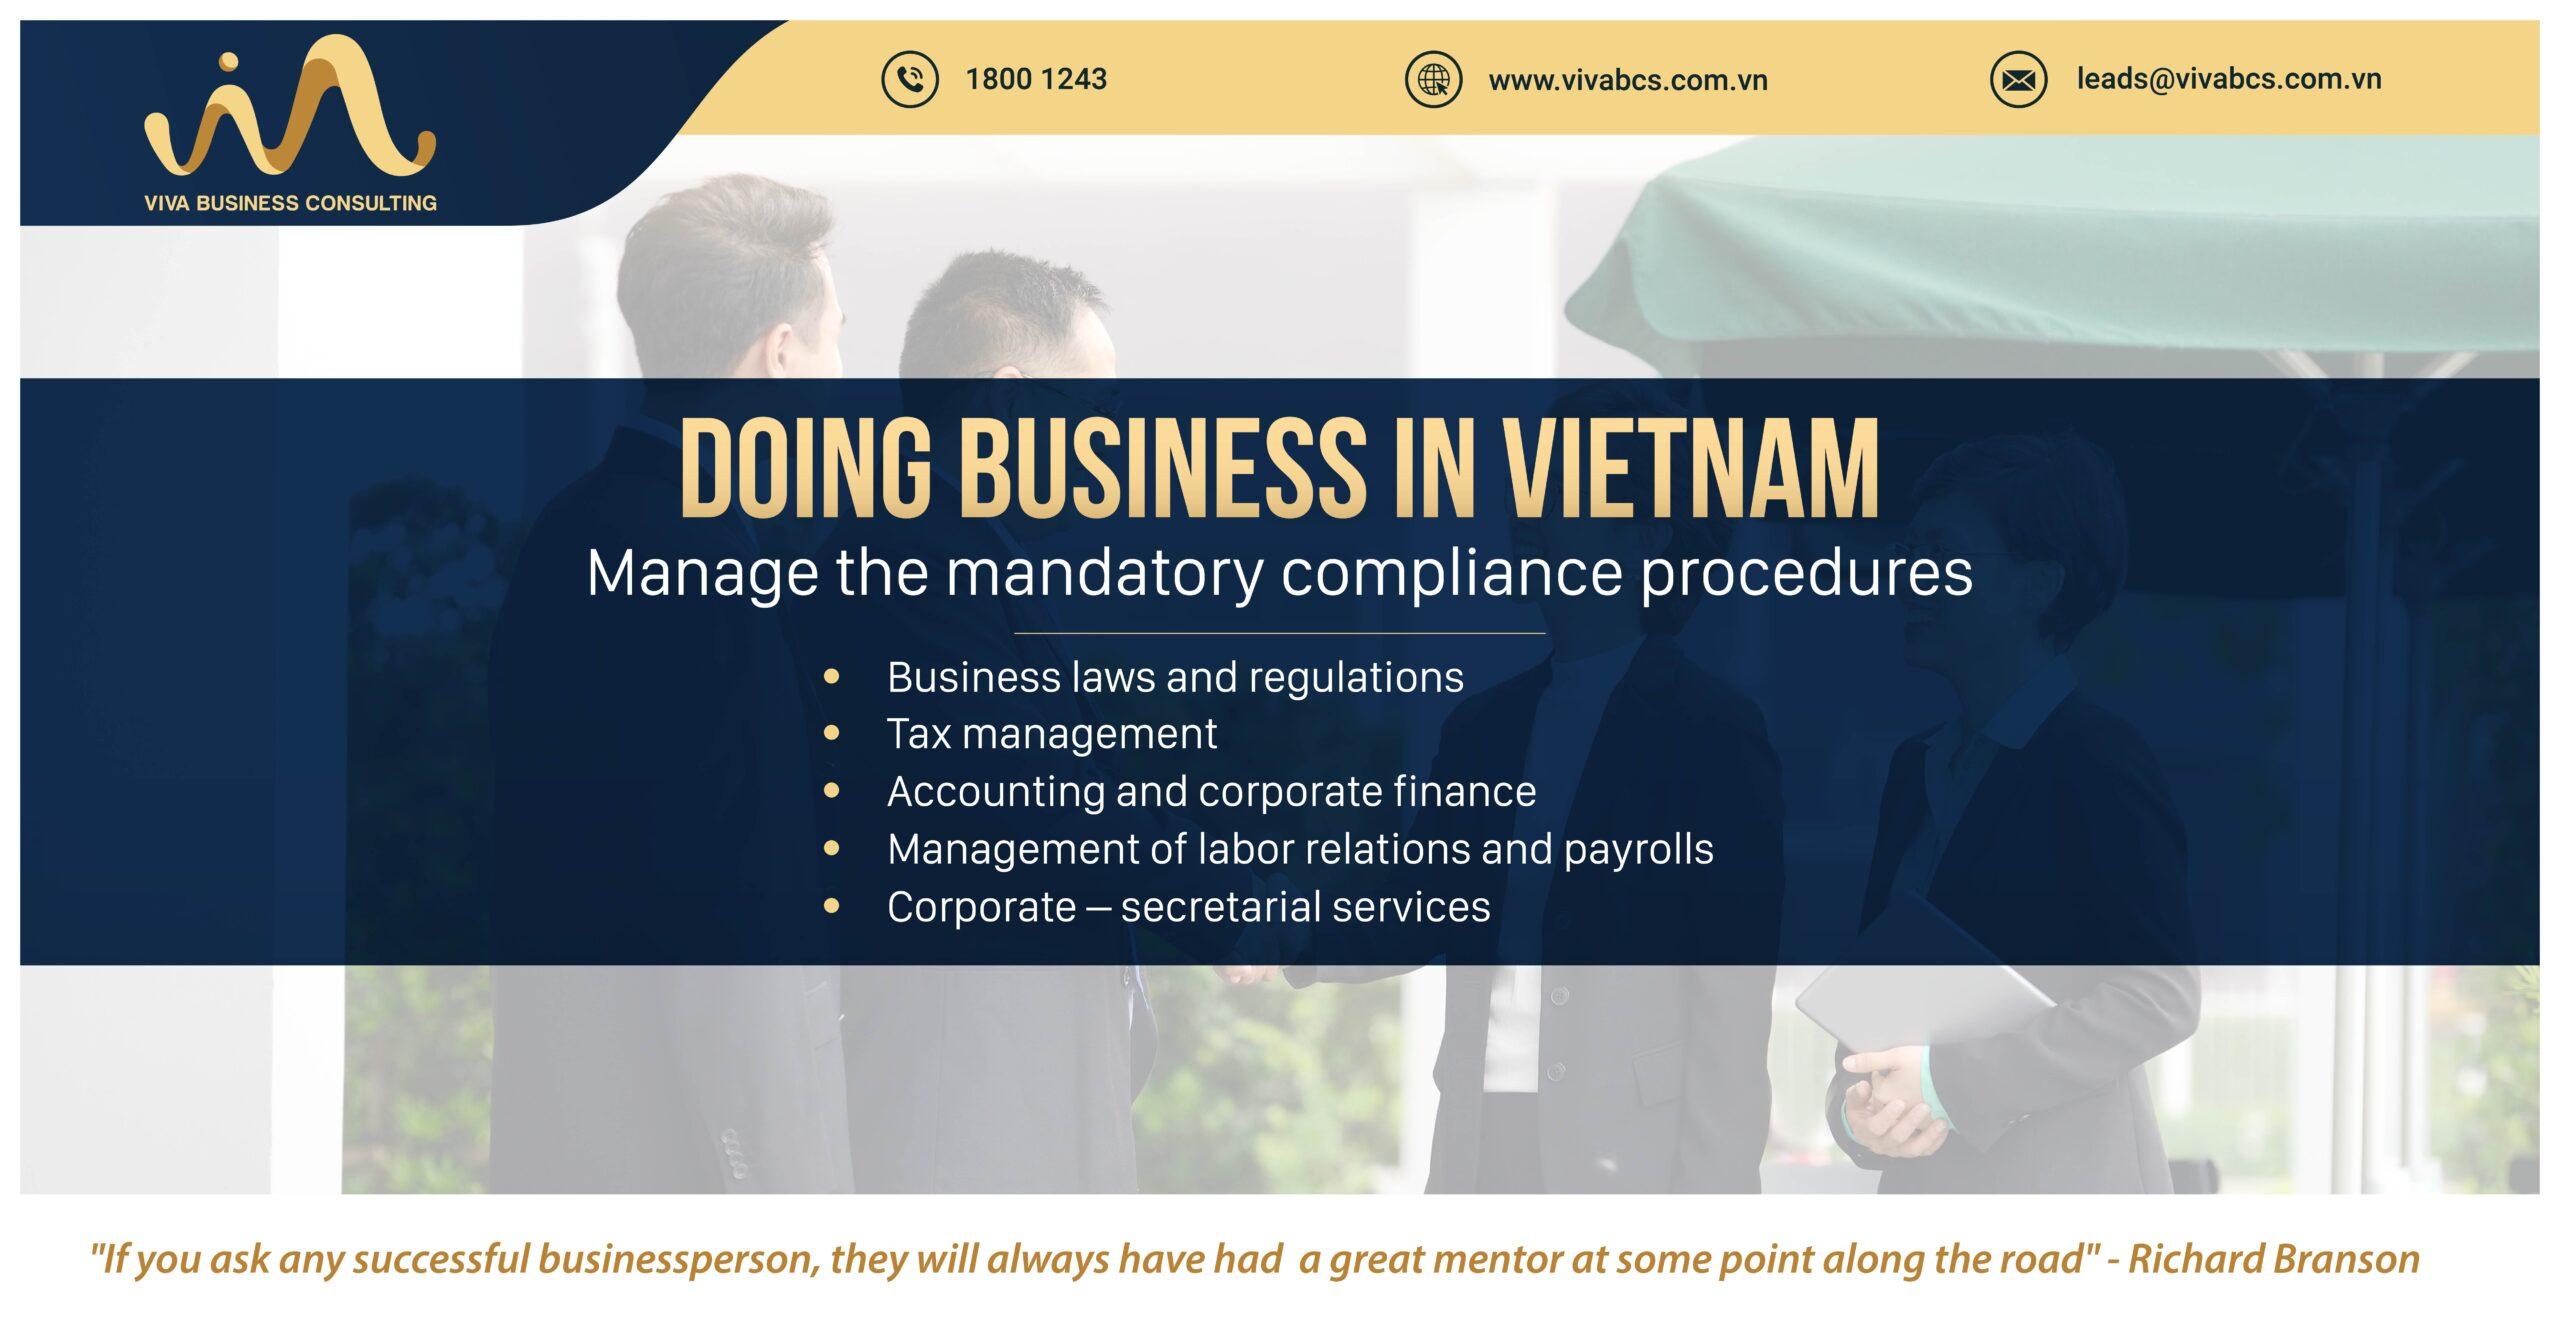 Doing business in Vietnam: Manage compliance procedures